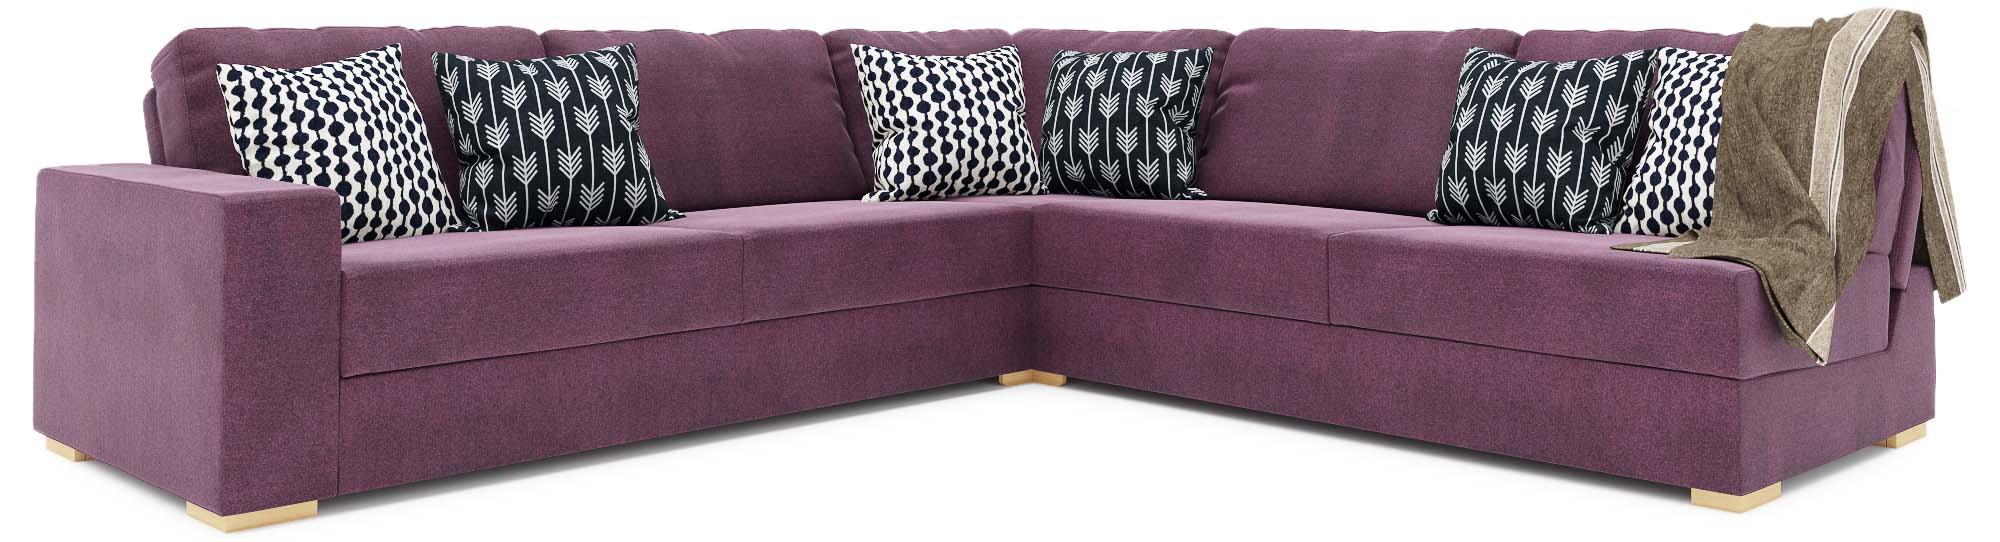 Ula Armless 3X3 Double Sofa Bed